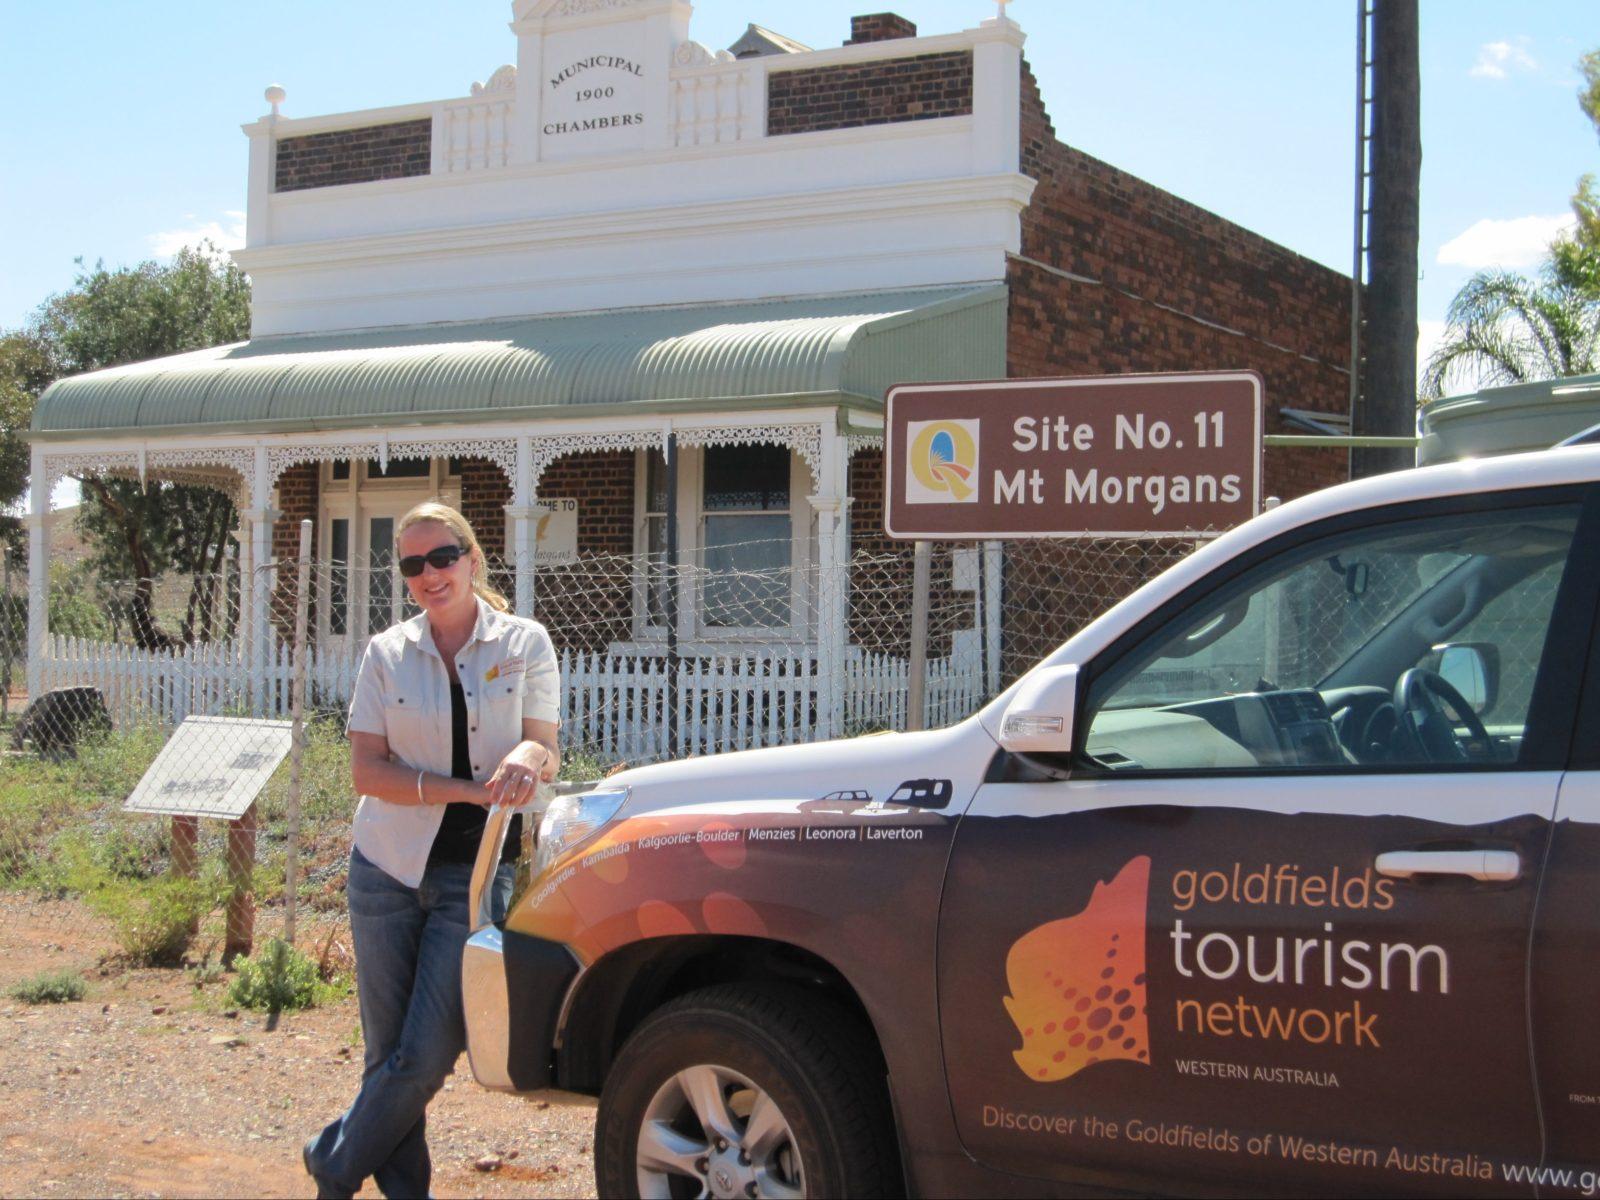 Golden Quest Discovery Trail, Kalgoorlie, Western Australia